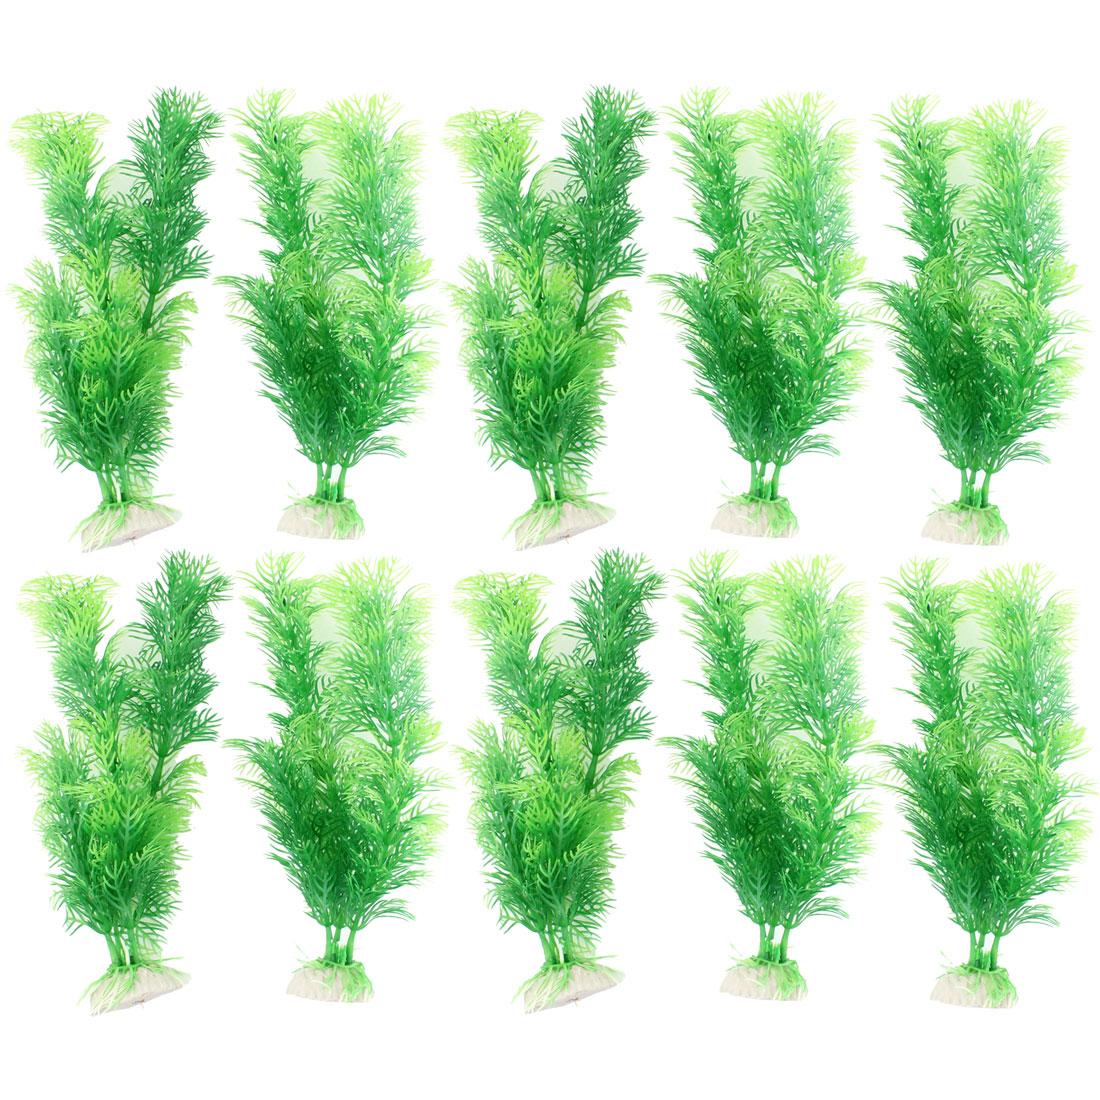 "10 Pcs 8.7"" High Underwater Plastic Plants Grass Green for Fish Tank Aquarium"